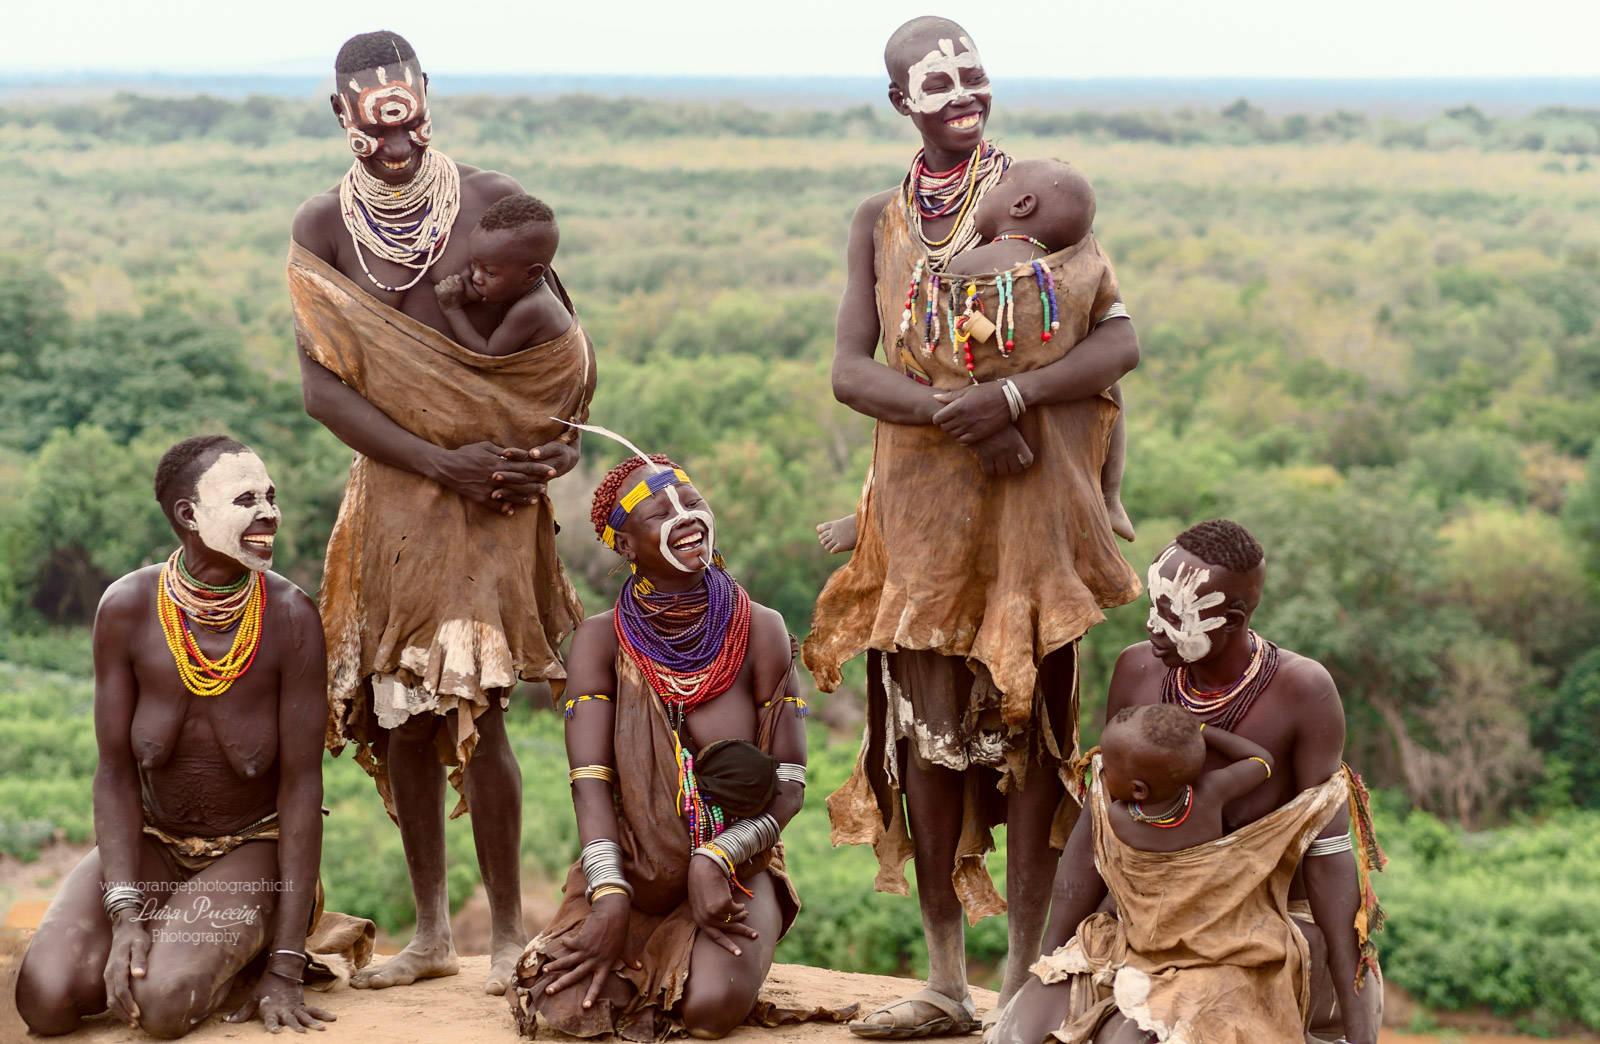 foto di viaggio: i Karo d'Etiopia